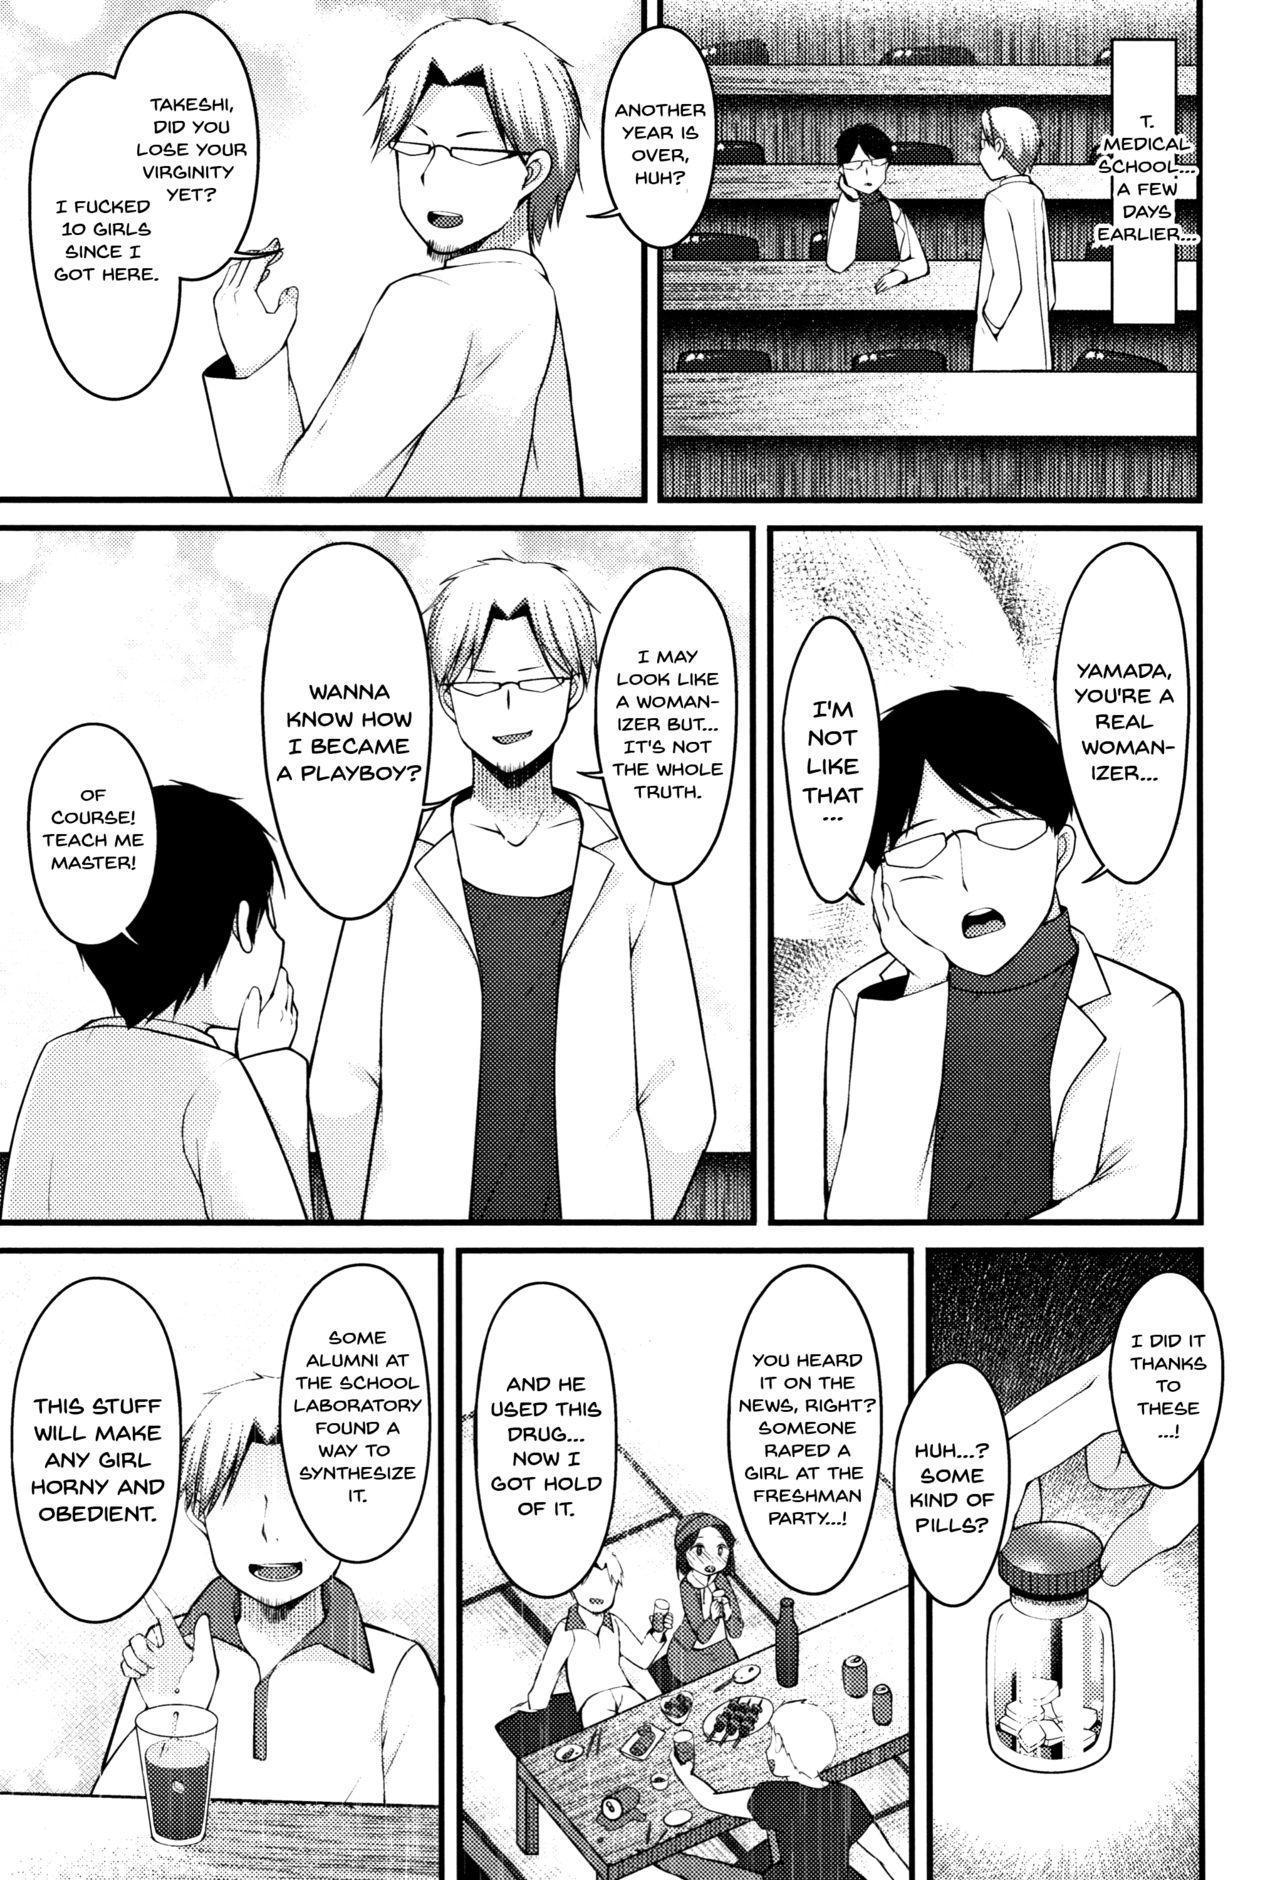 [Kotoba Ai] Sis-pai Heaven! Ch. 1-5 [English] 32